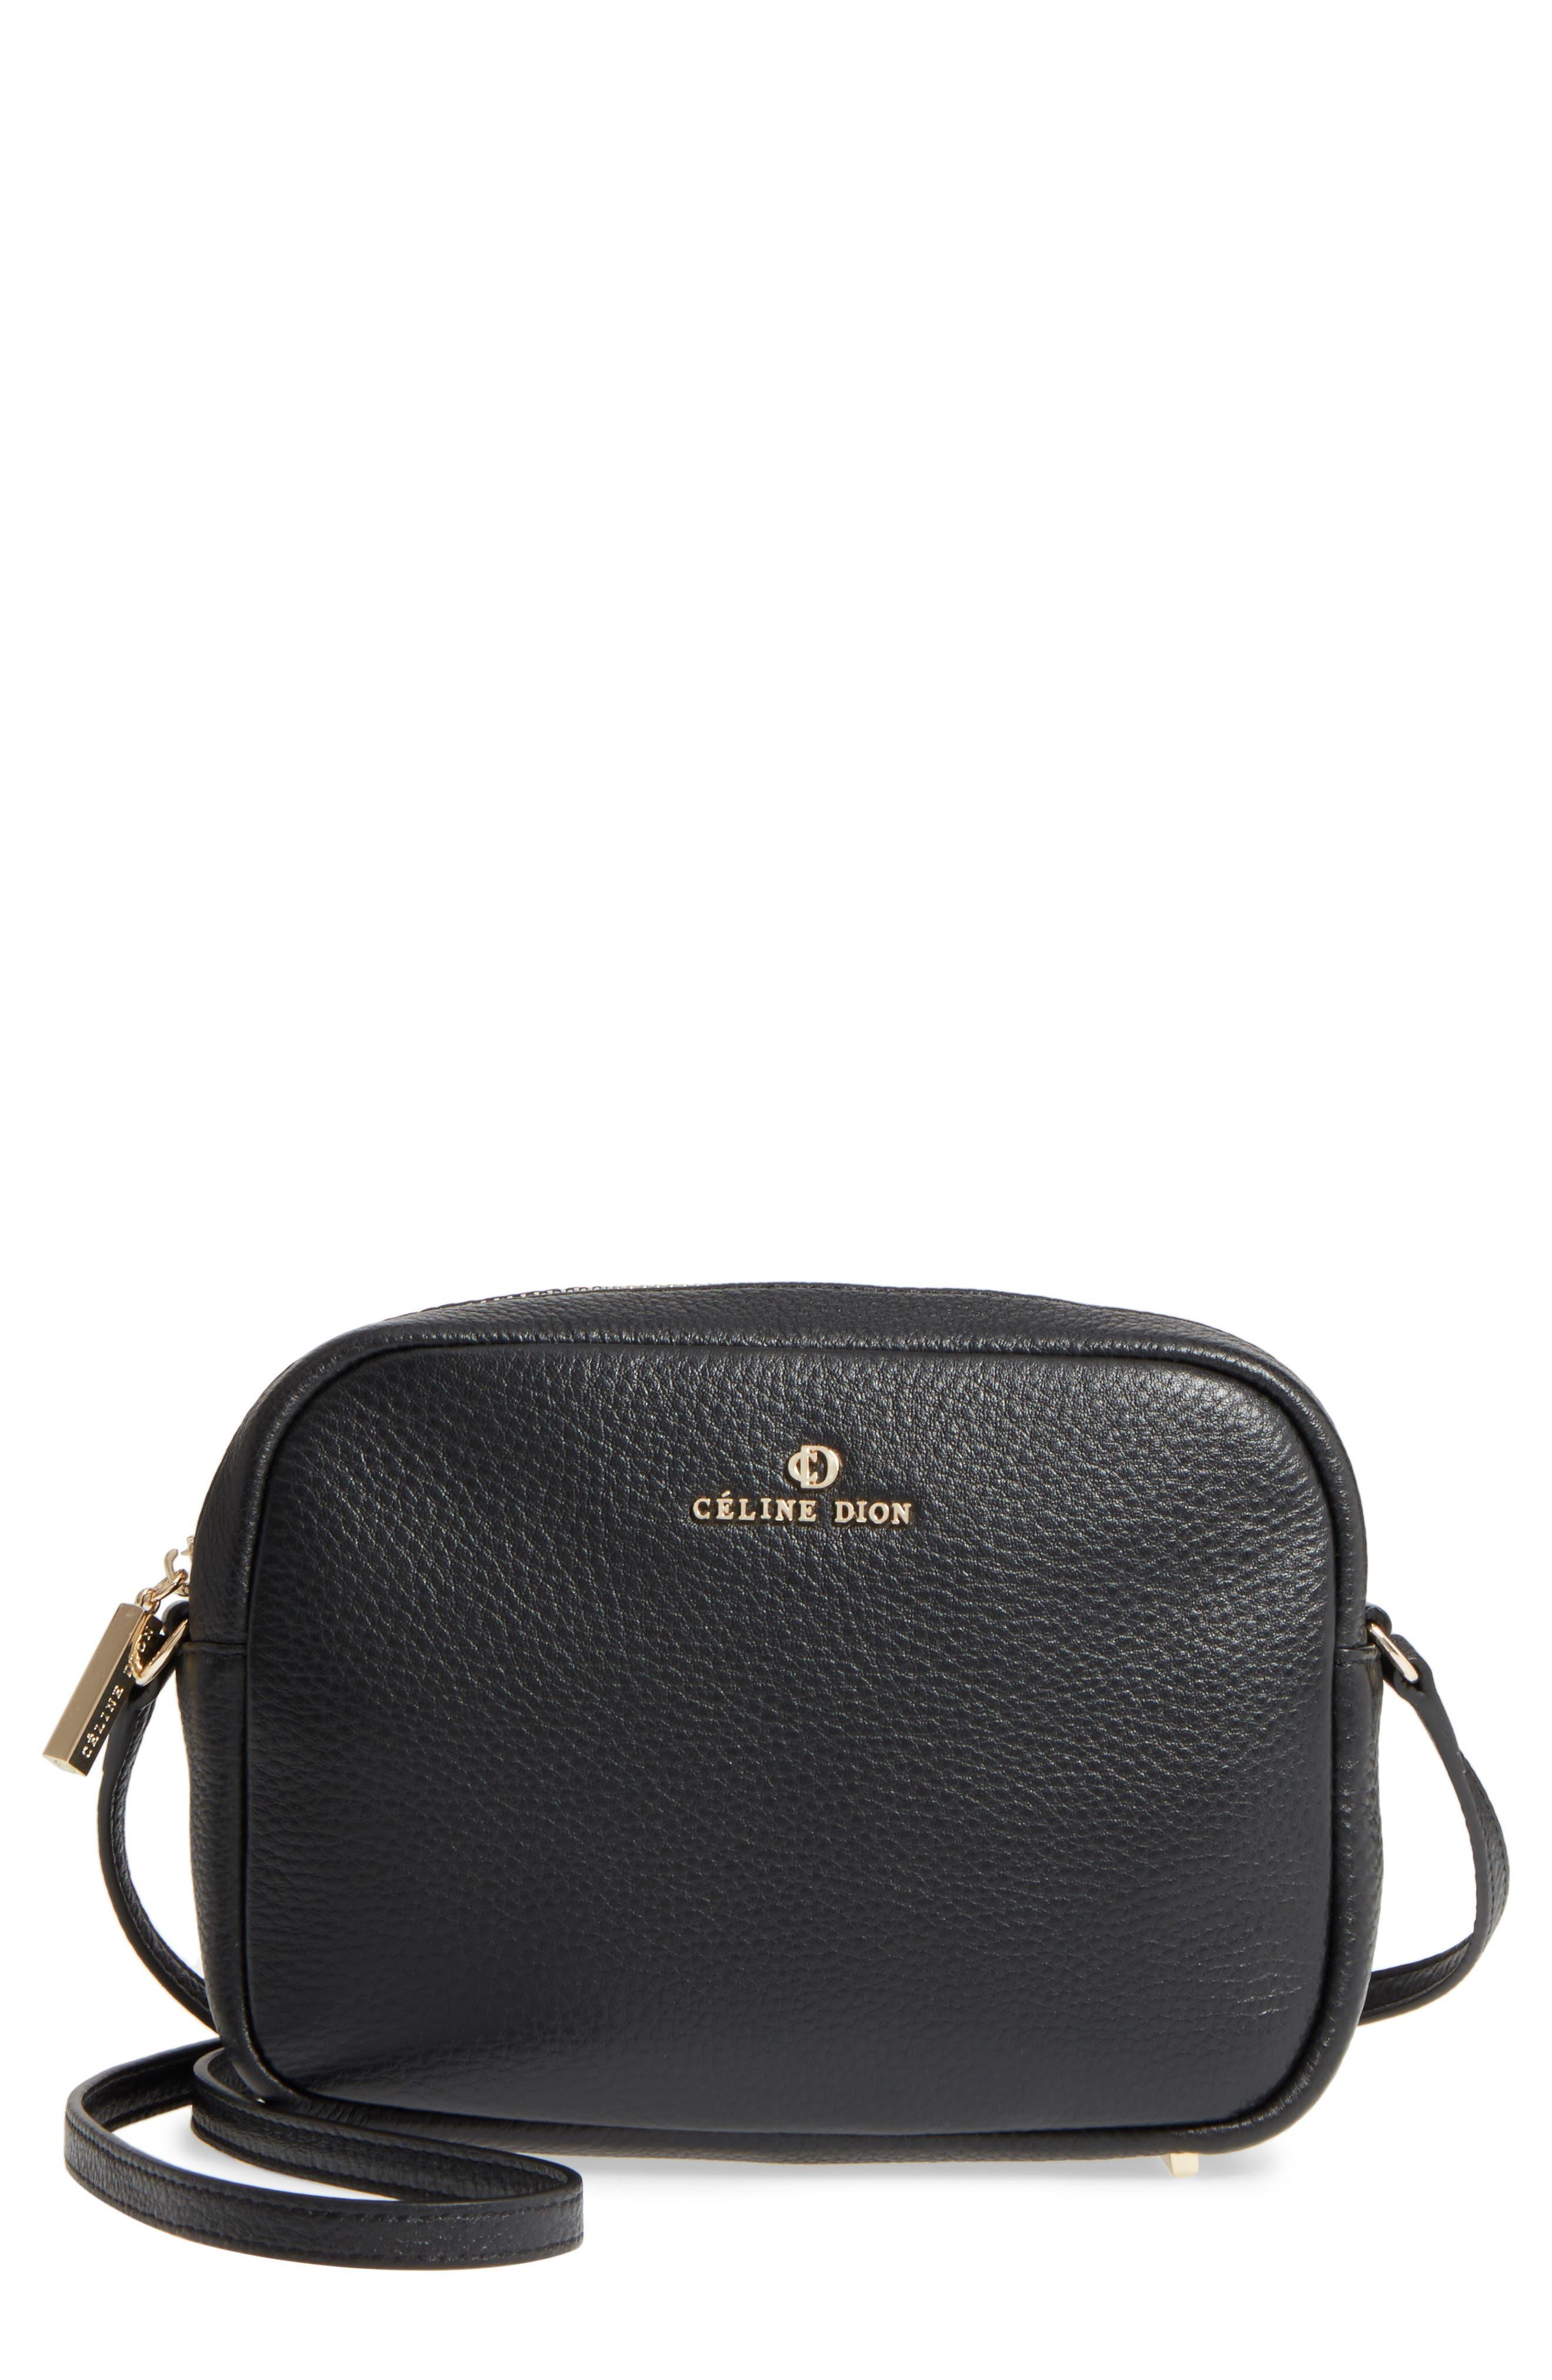 Céline Dion Adagio Leather Camera Crossbody Bag,                             Main thumbnail 1, color,                             Black